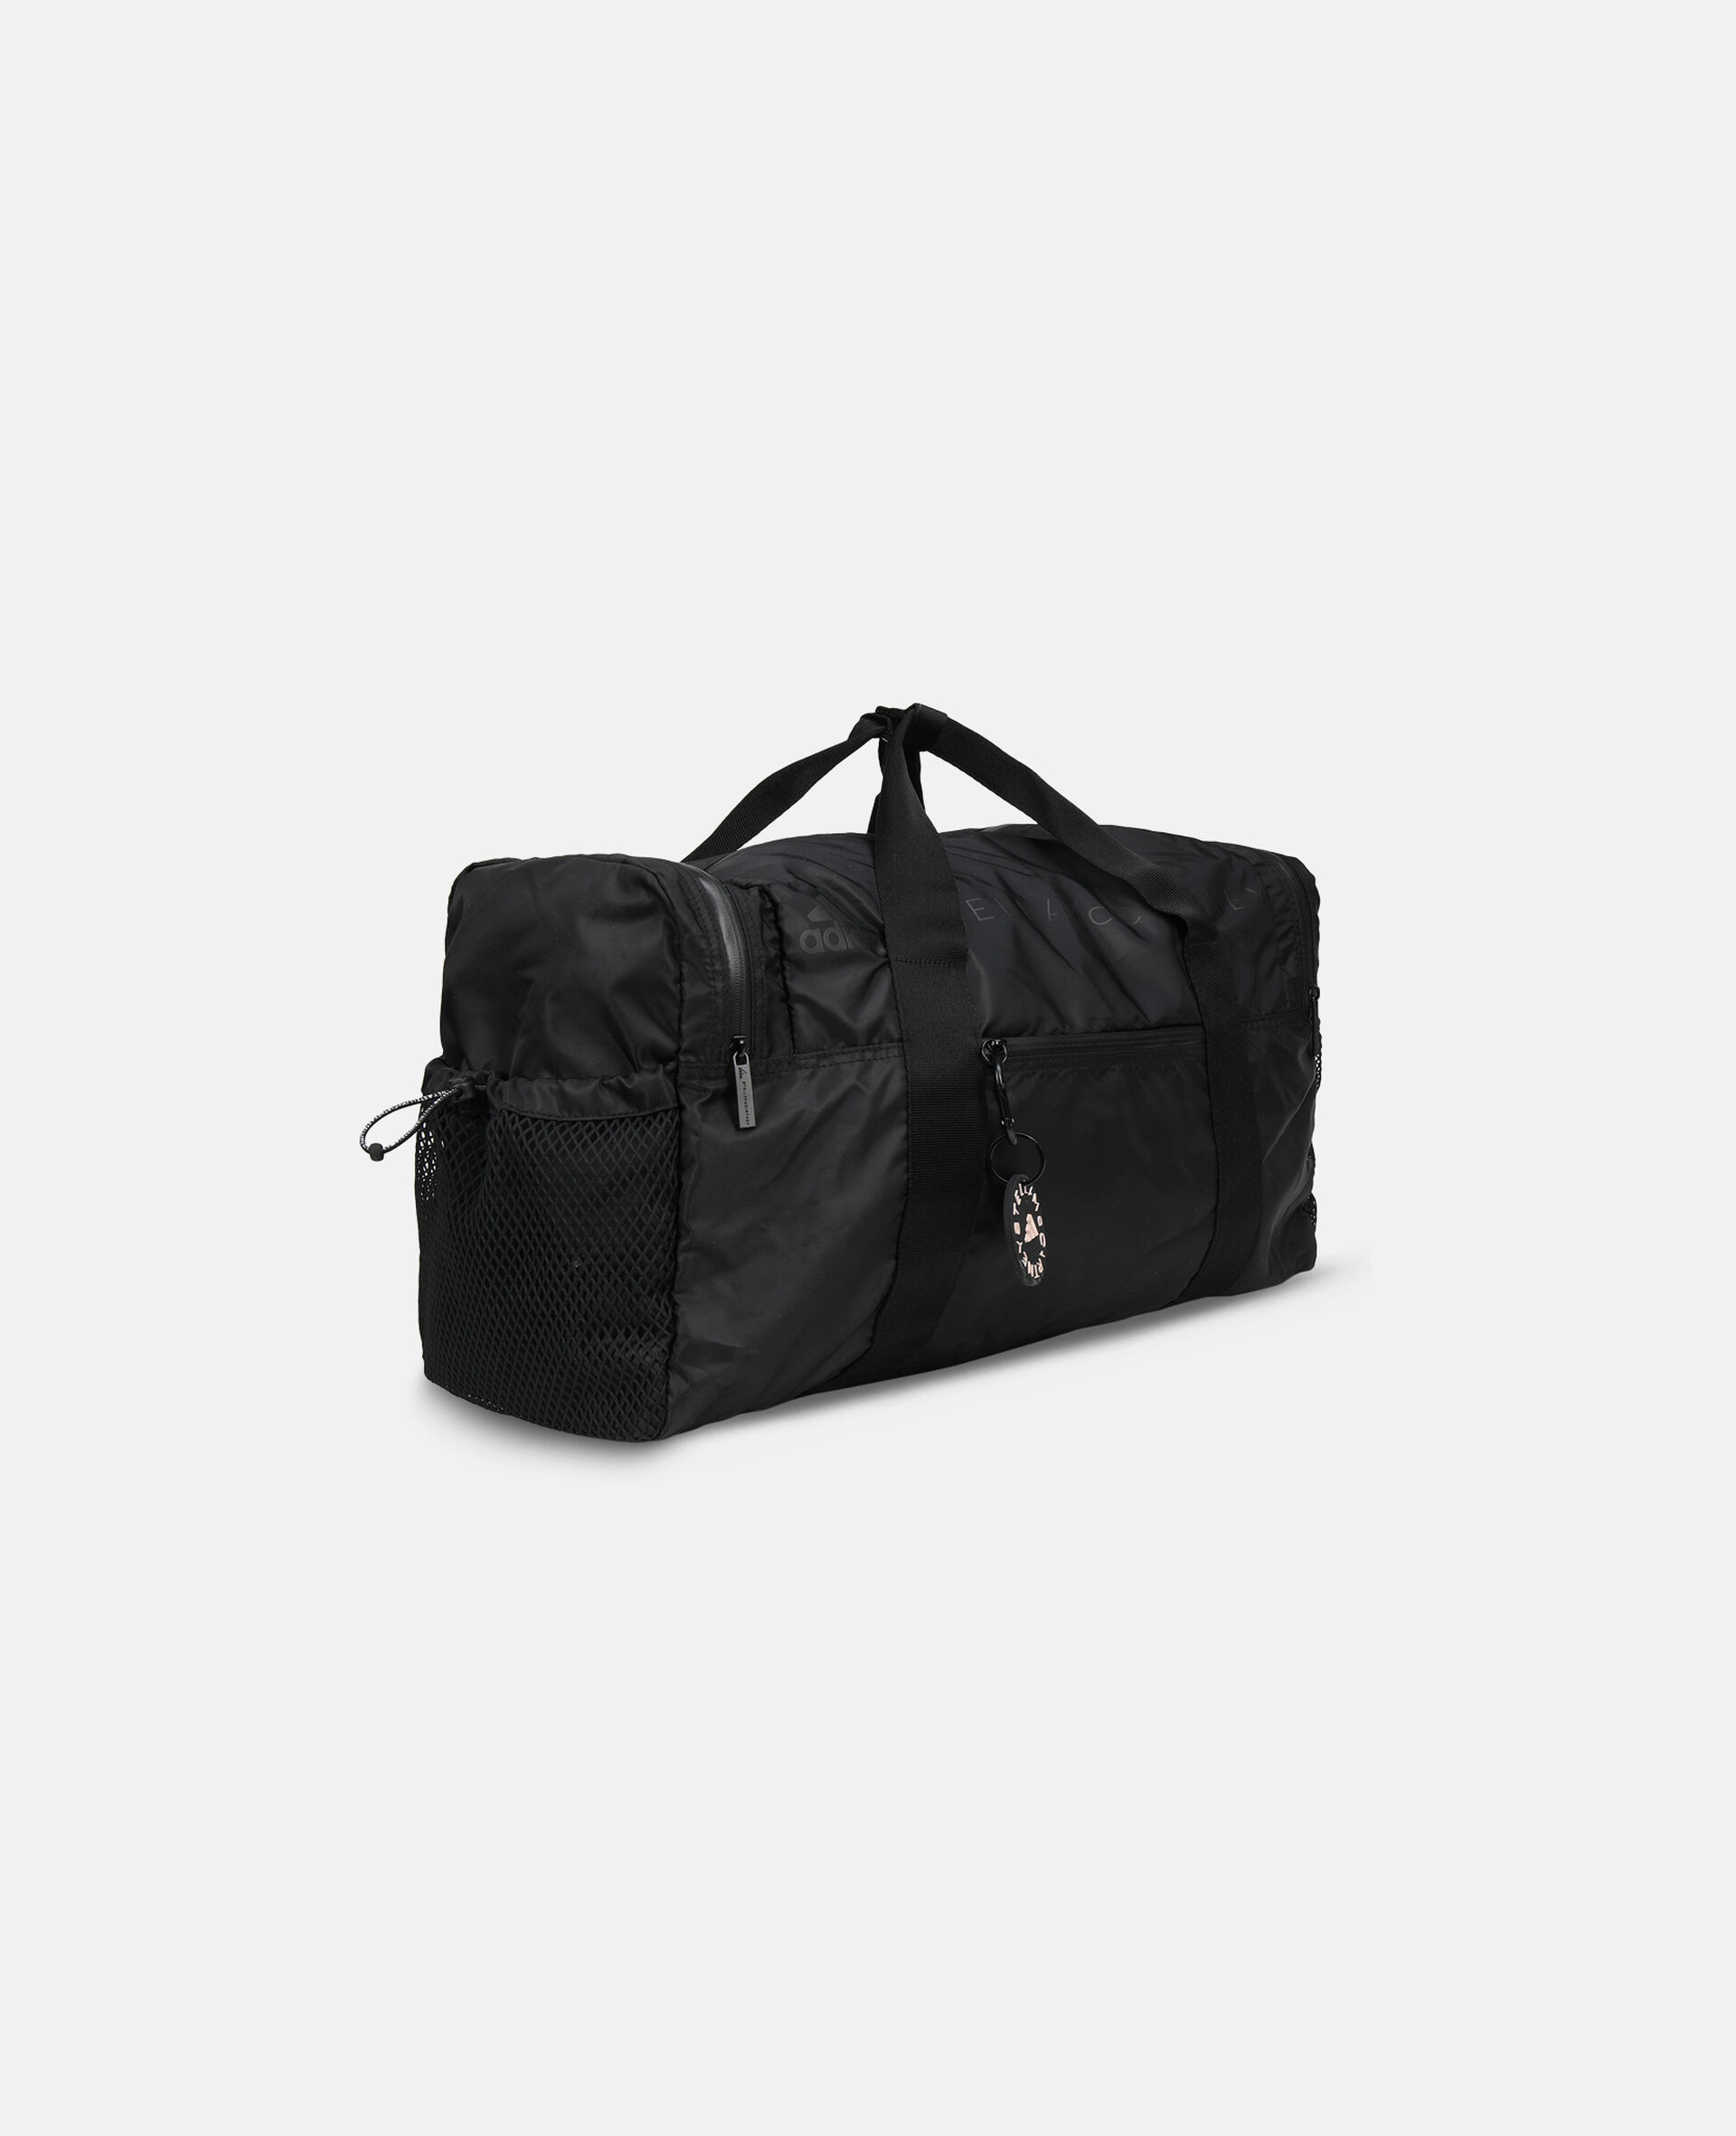 Sac Studiobag carré noir-Noir-large image number 1